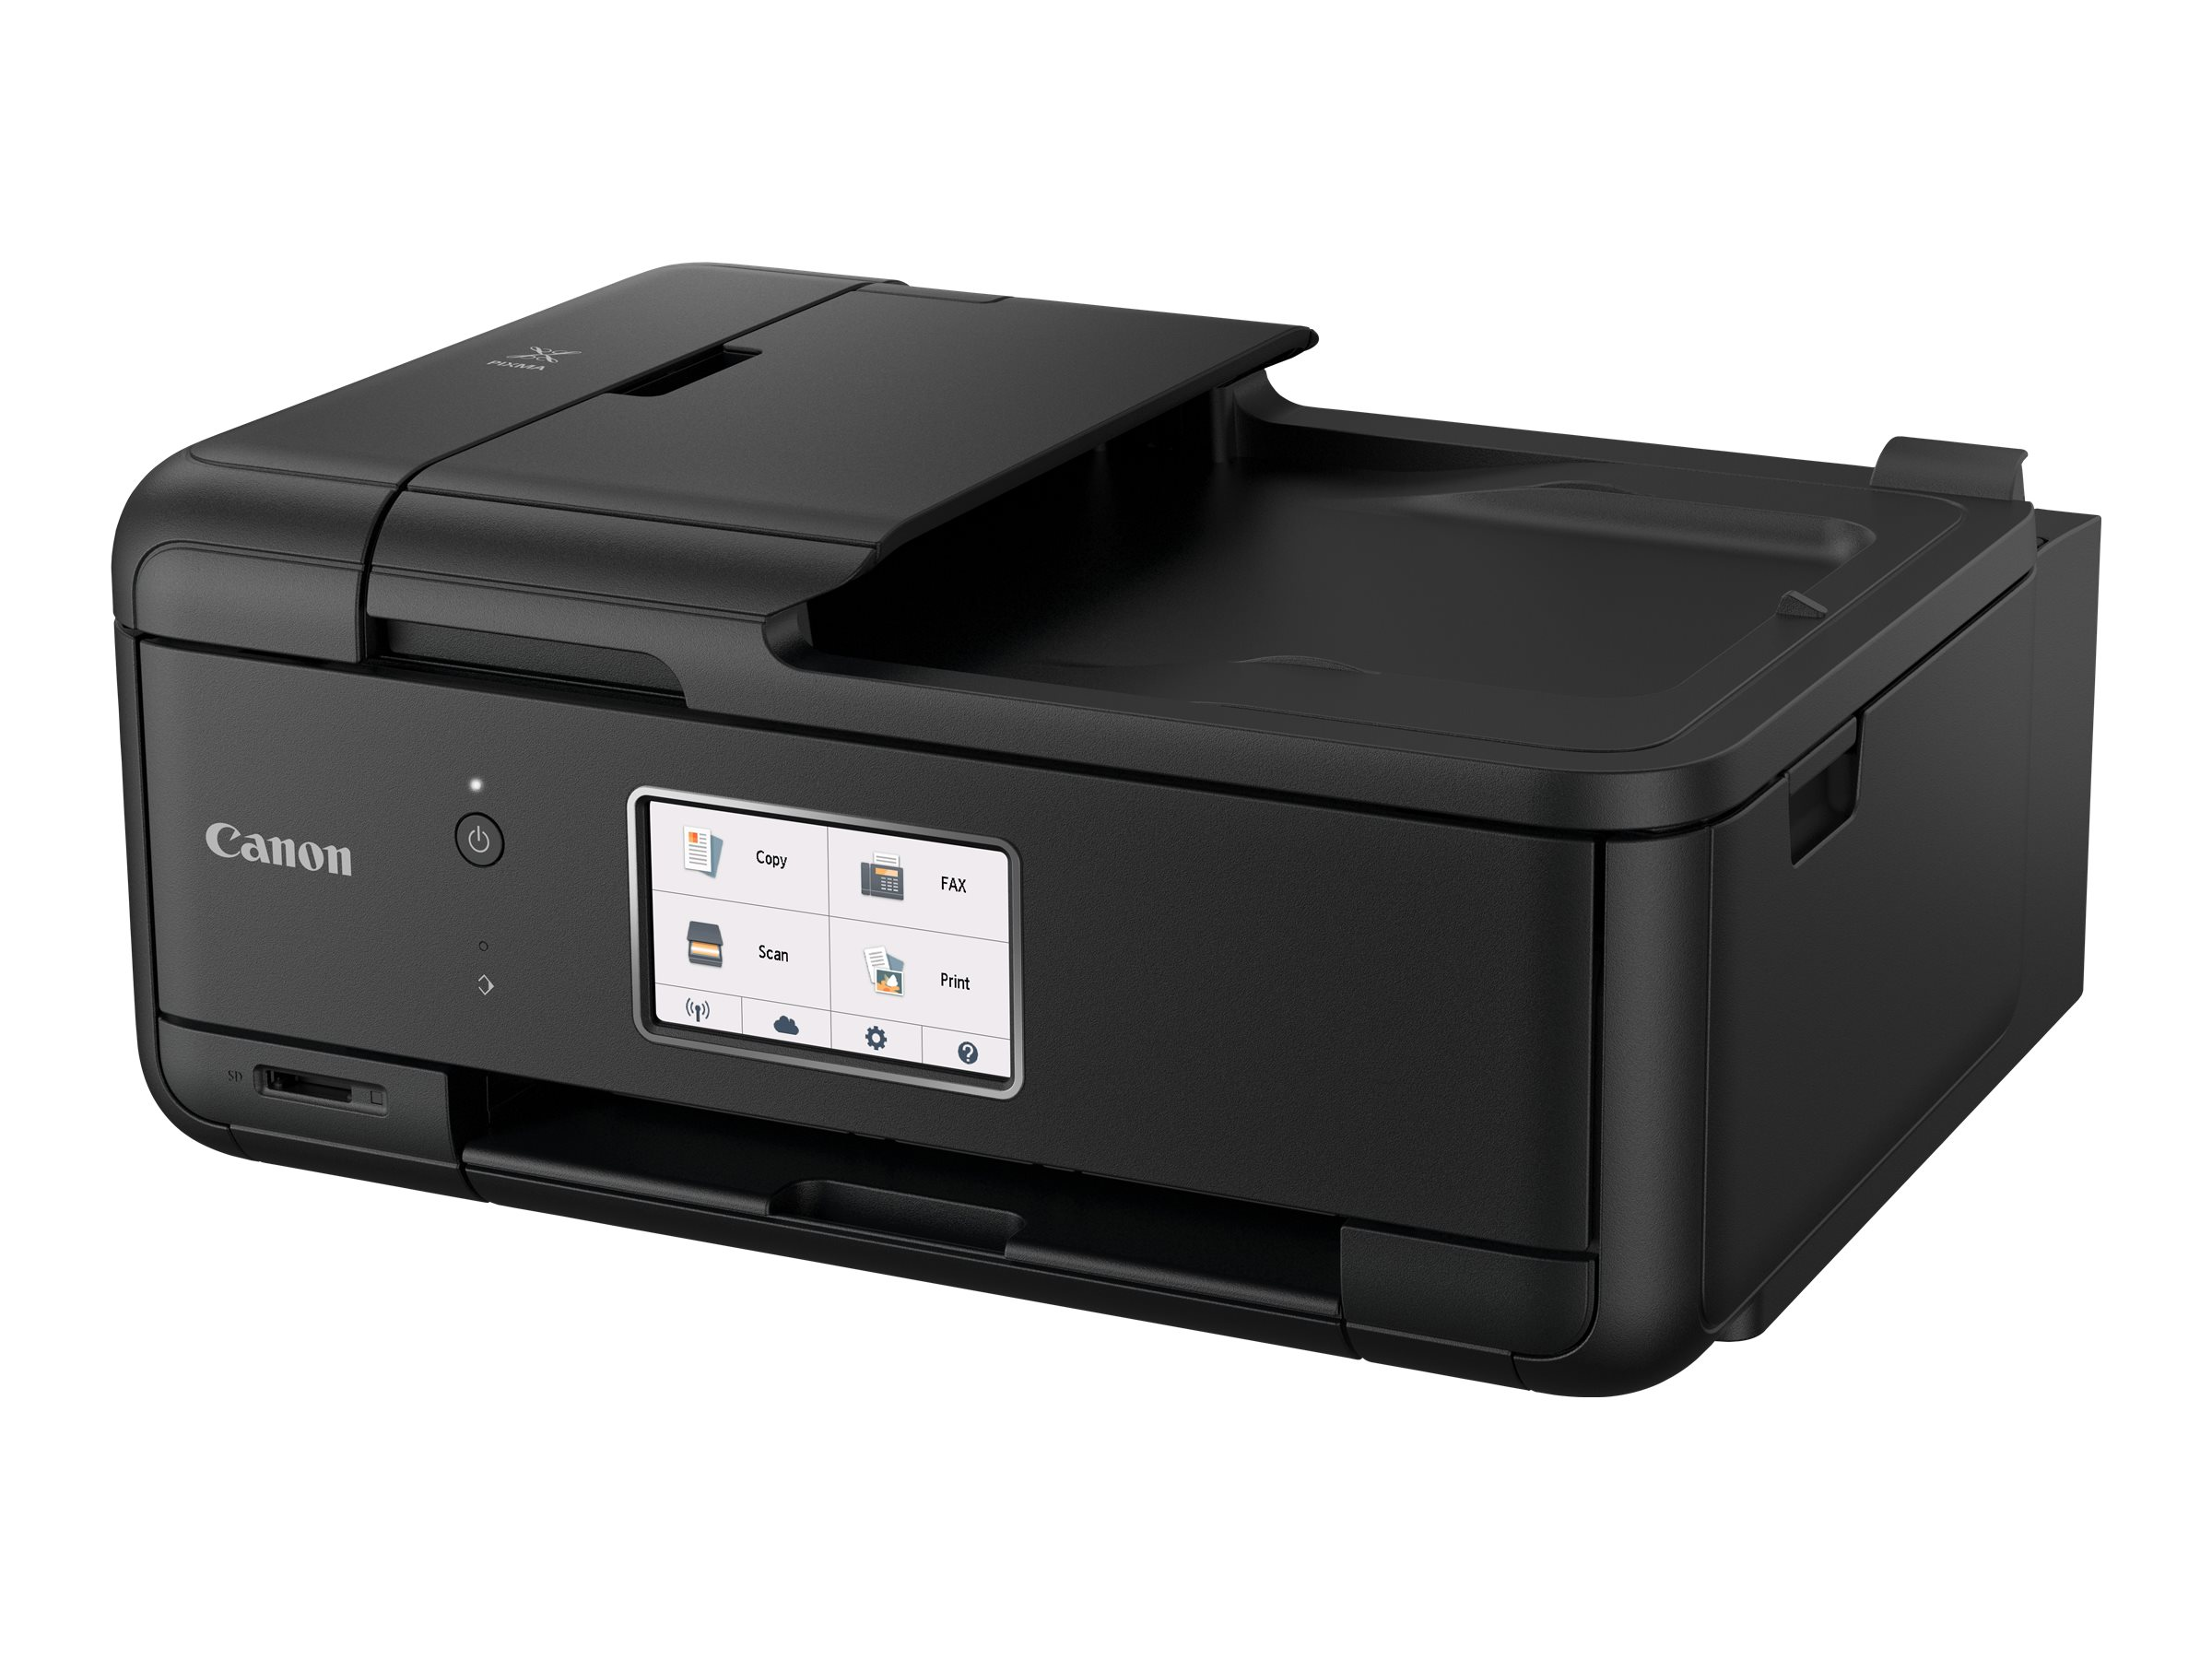 canon pixma tr8550 multifunktionsdrucker. Black Bedroom Furniture Sets. Home Design Ideas